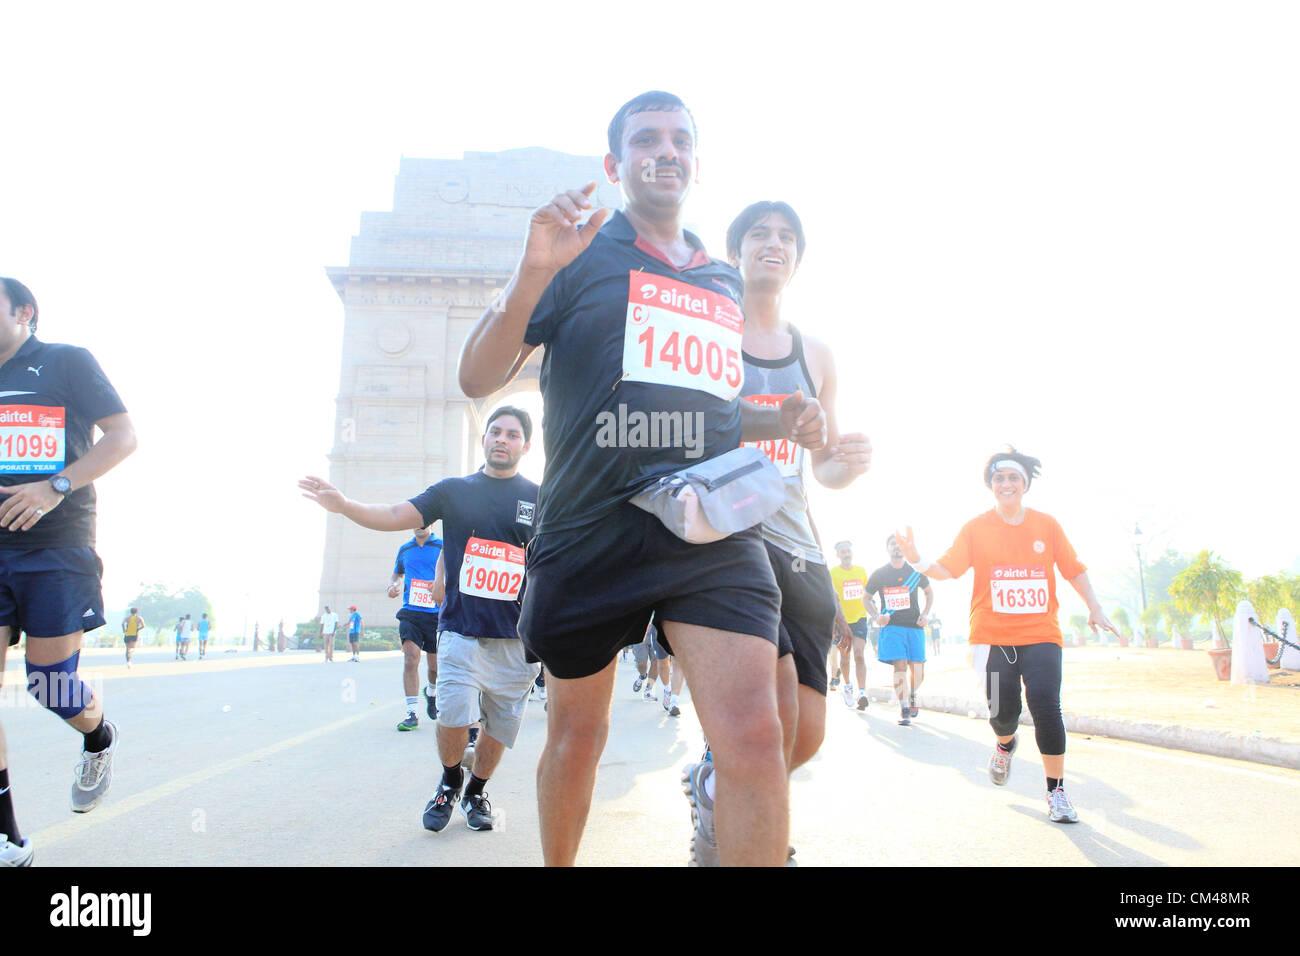 Sep. 30, 2012 - New Delhi, India - Delhi residents participate in the New Delhi Half Marathon as they run by the famous New Delhi landmark, the India Gate. (Credit Image: © Subhash Sharma/ZUMAPRESS.com) Stock Photo